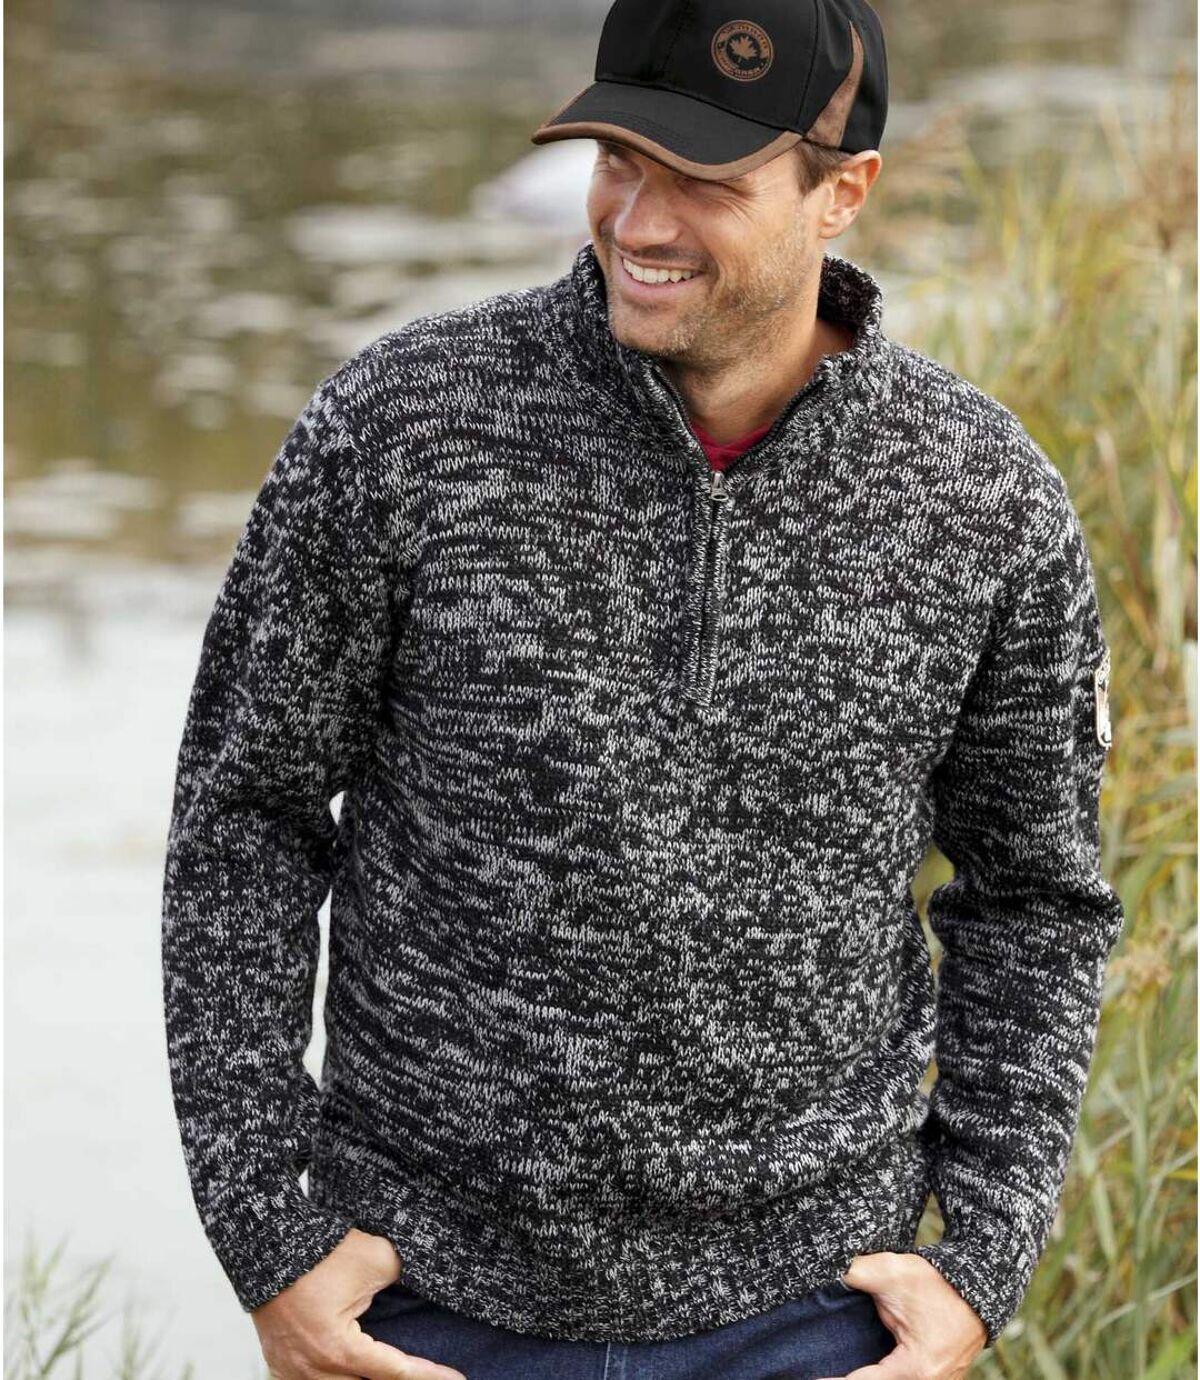 Melírovaný pulovr Canadian Way Atlas For Men